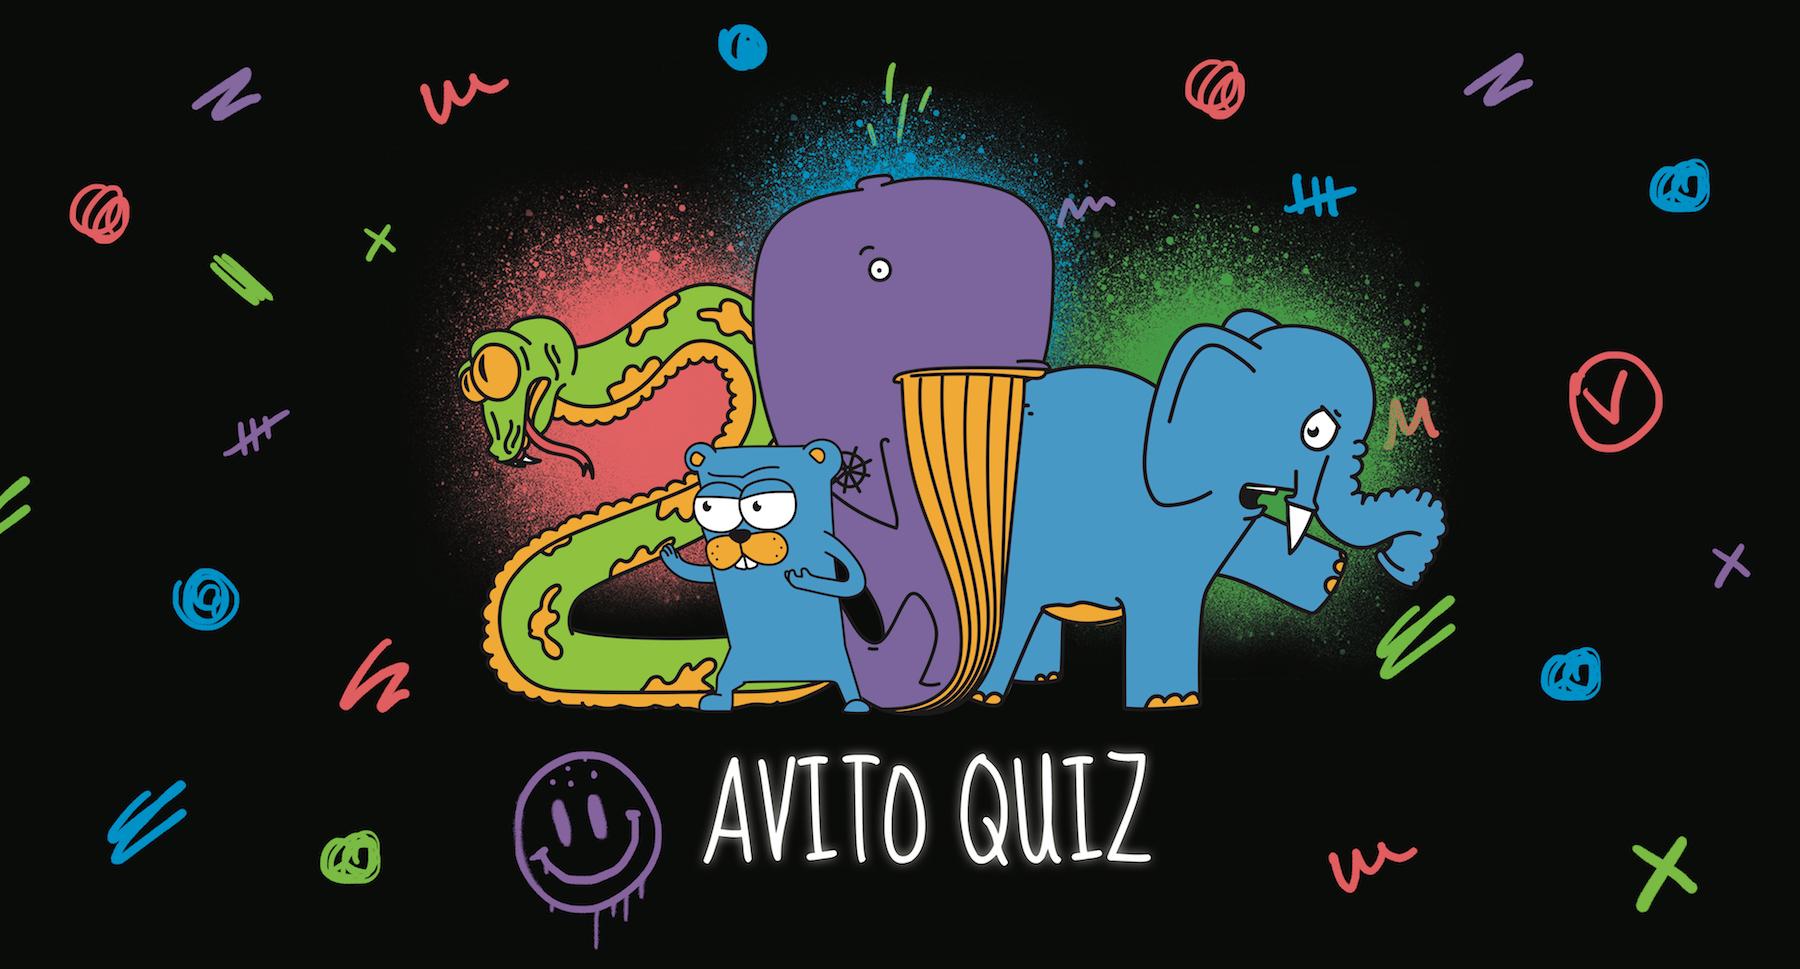 Тесты на знание Python, PHP, Golang и DevOps: разбор викторины AvitoQuiz на Highload